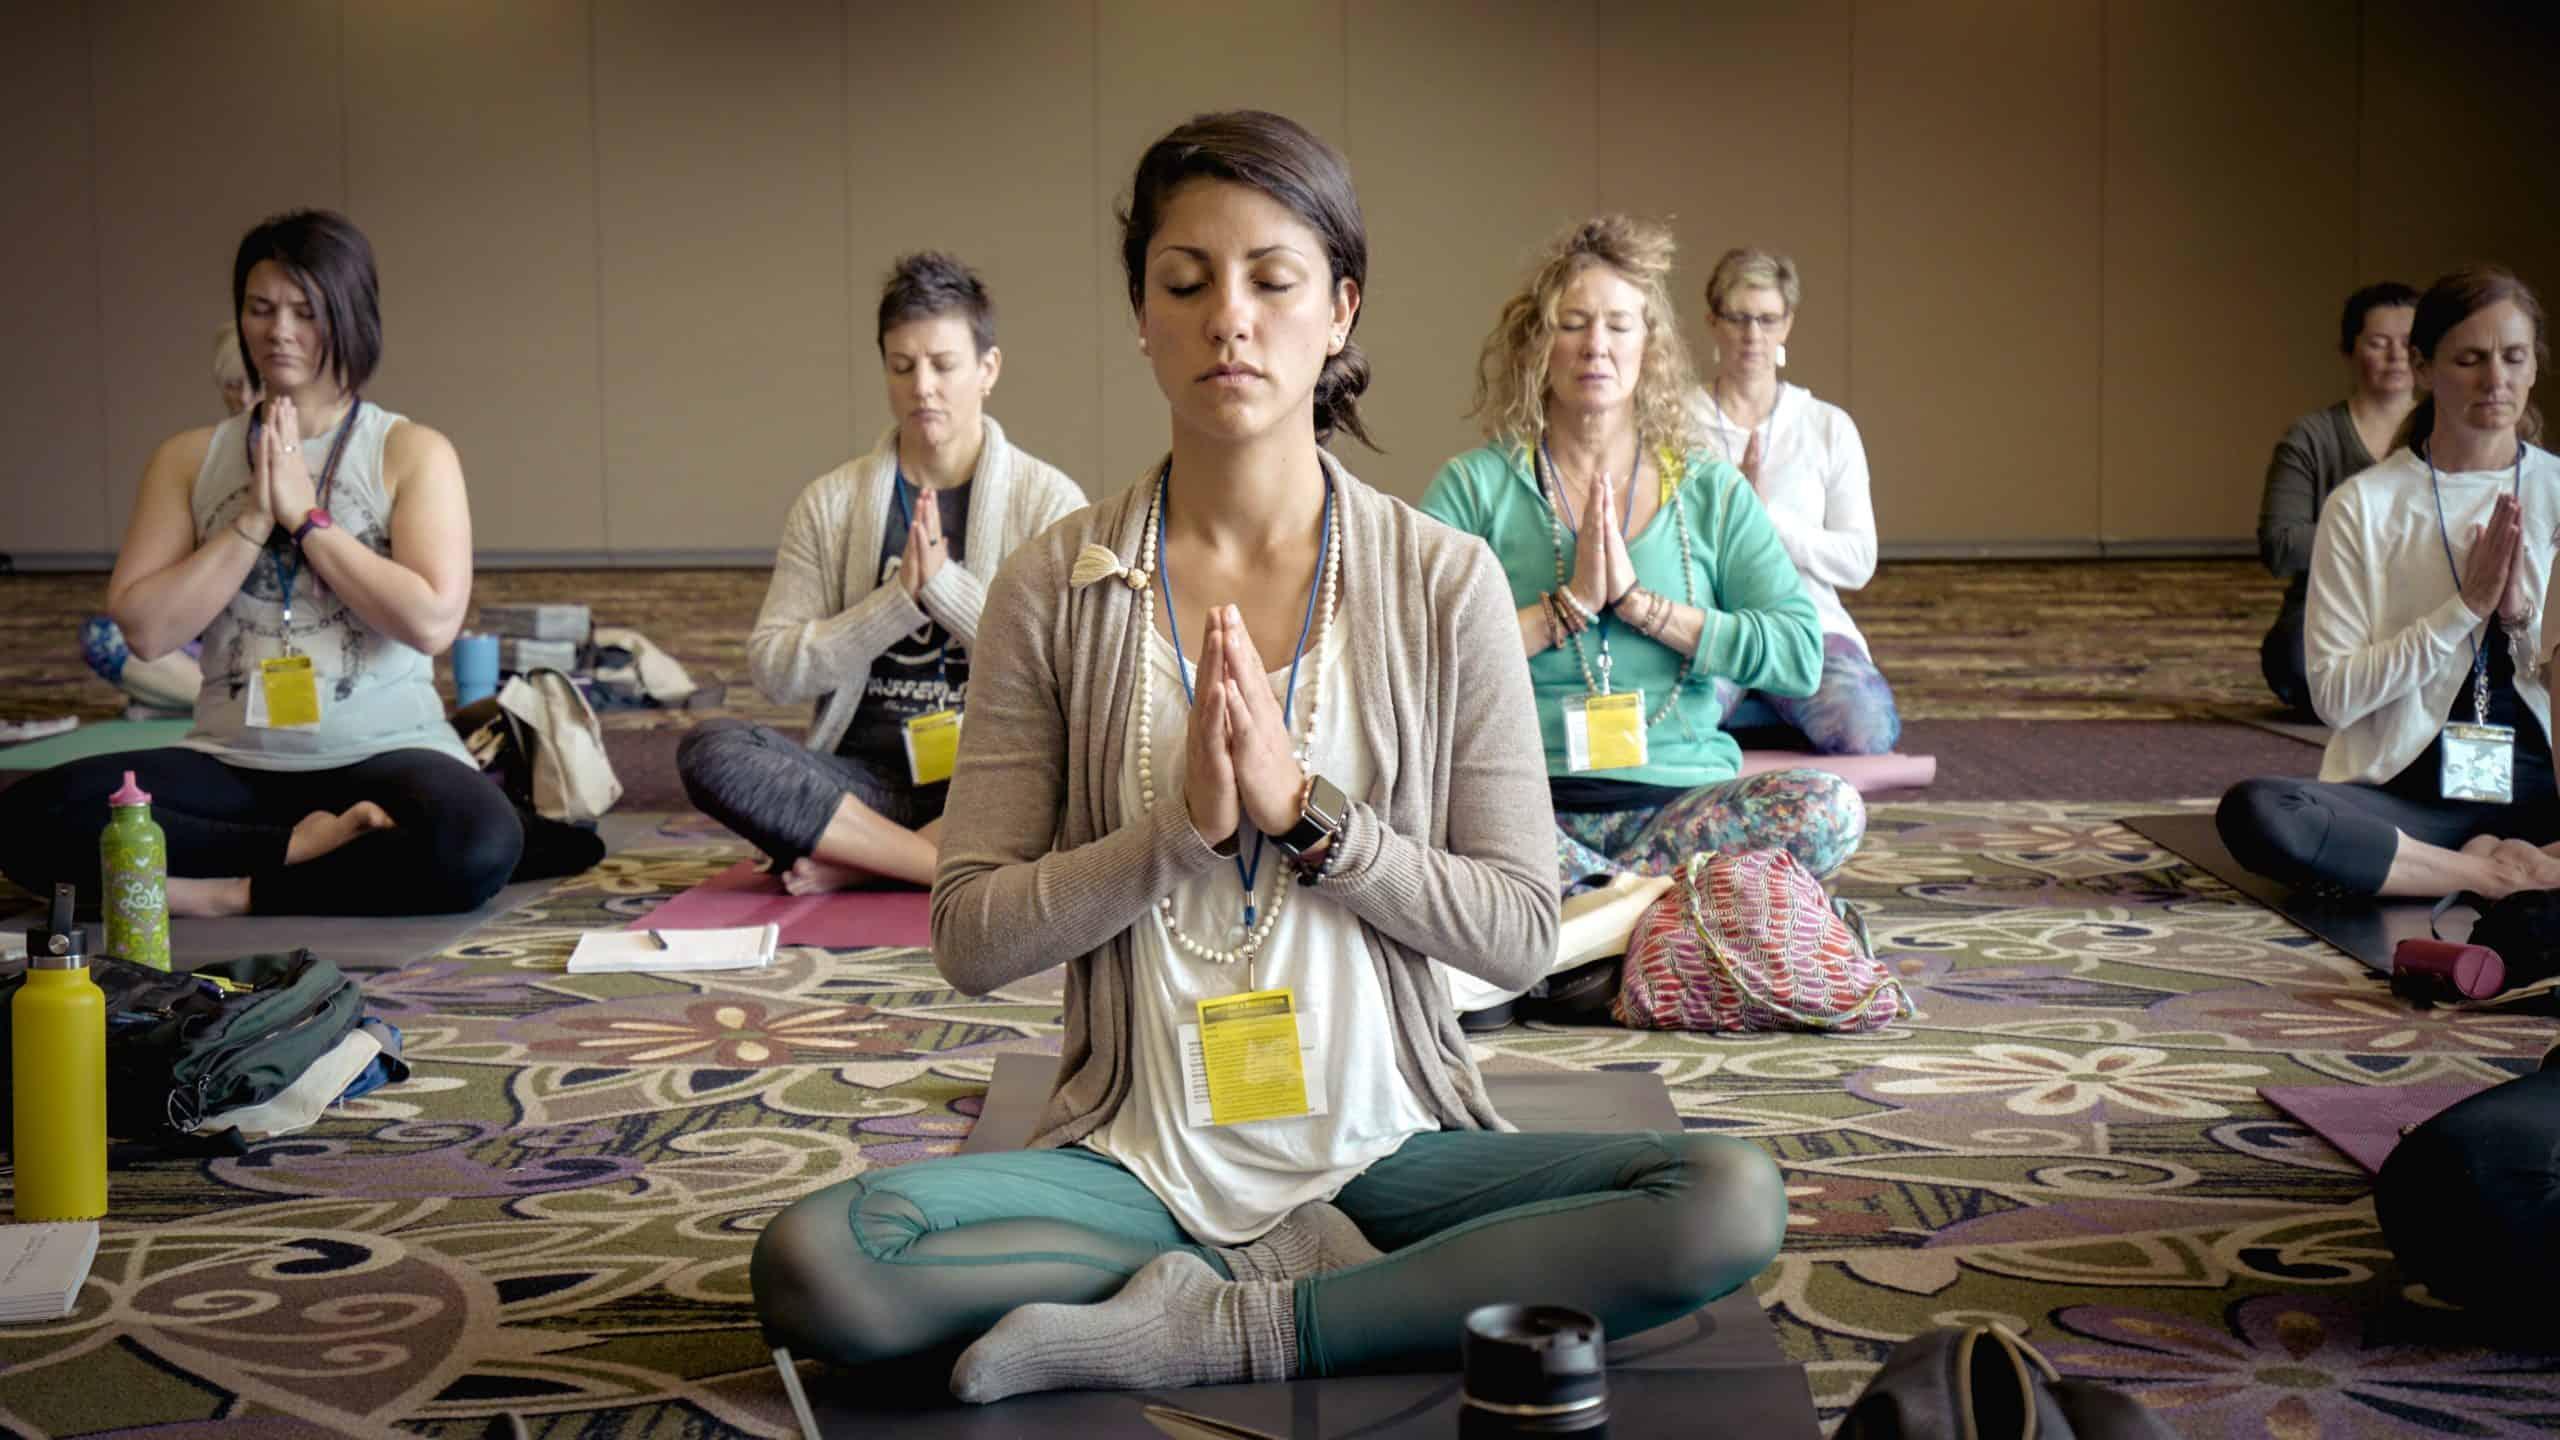 Photo by Erik Brolin on Unsplash of Women in Meditation pose Yoga class